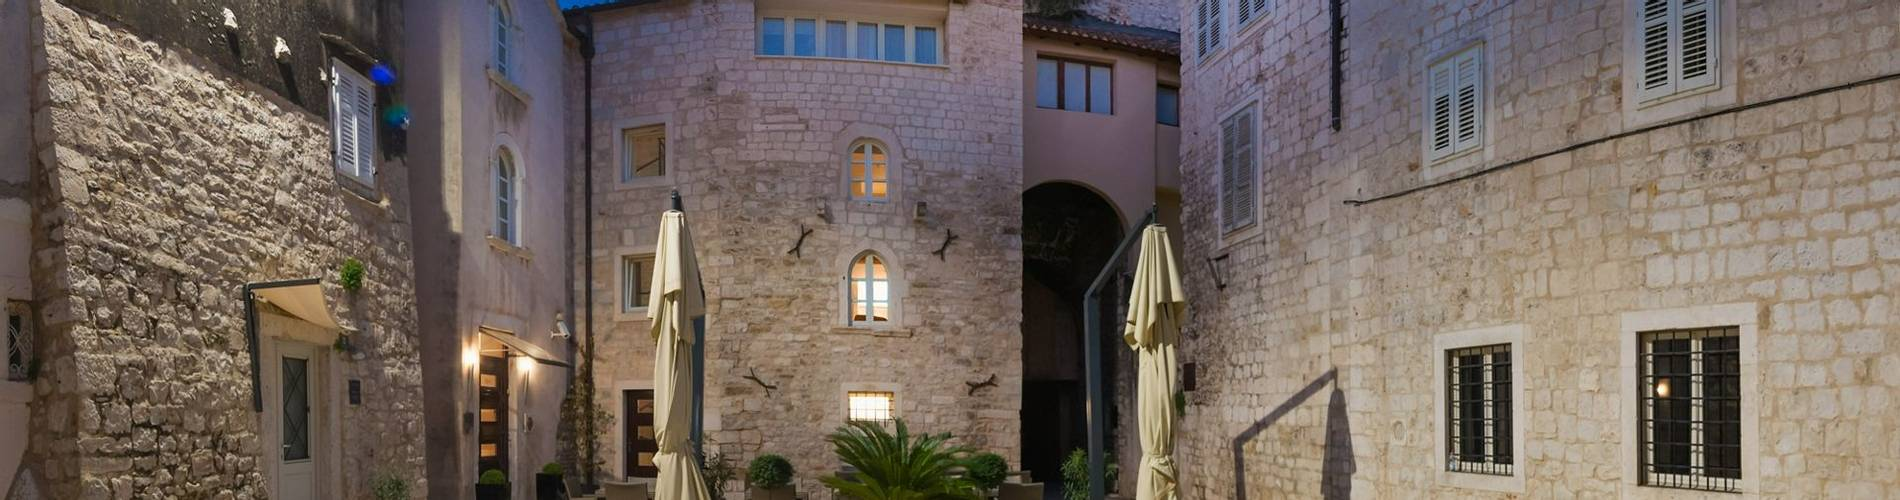 Hotel Vestibul Palace exterior.jpg